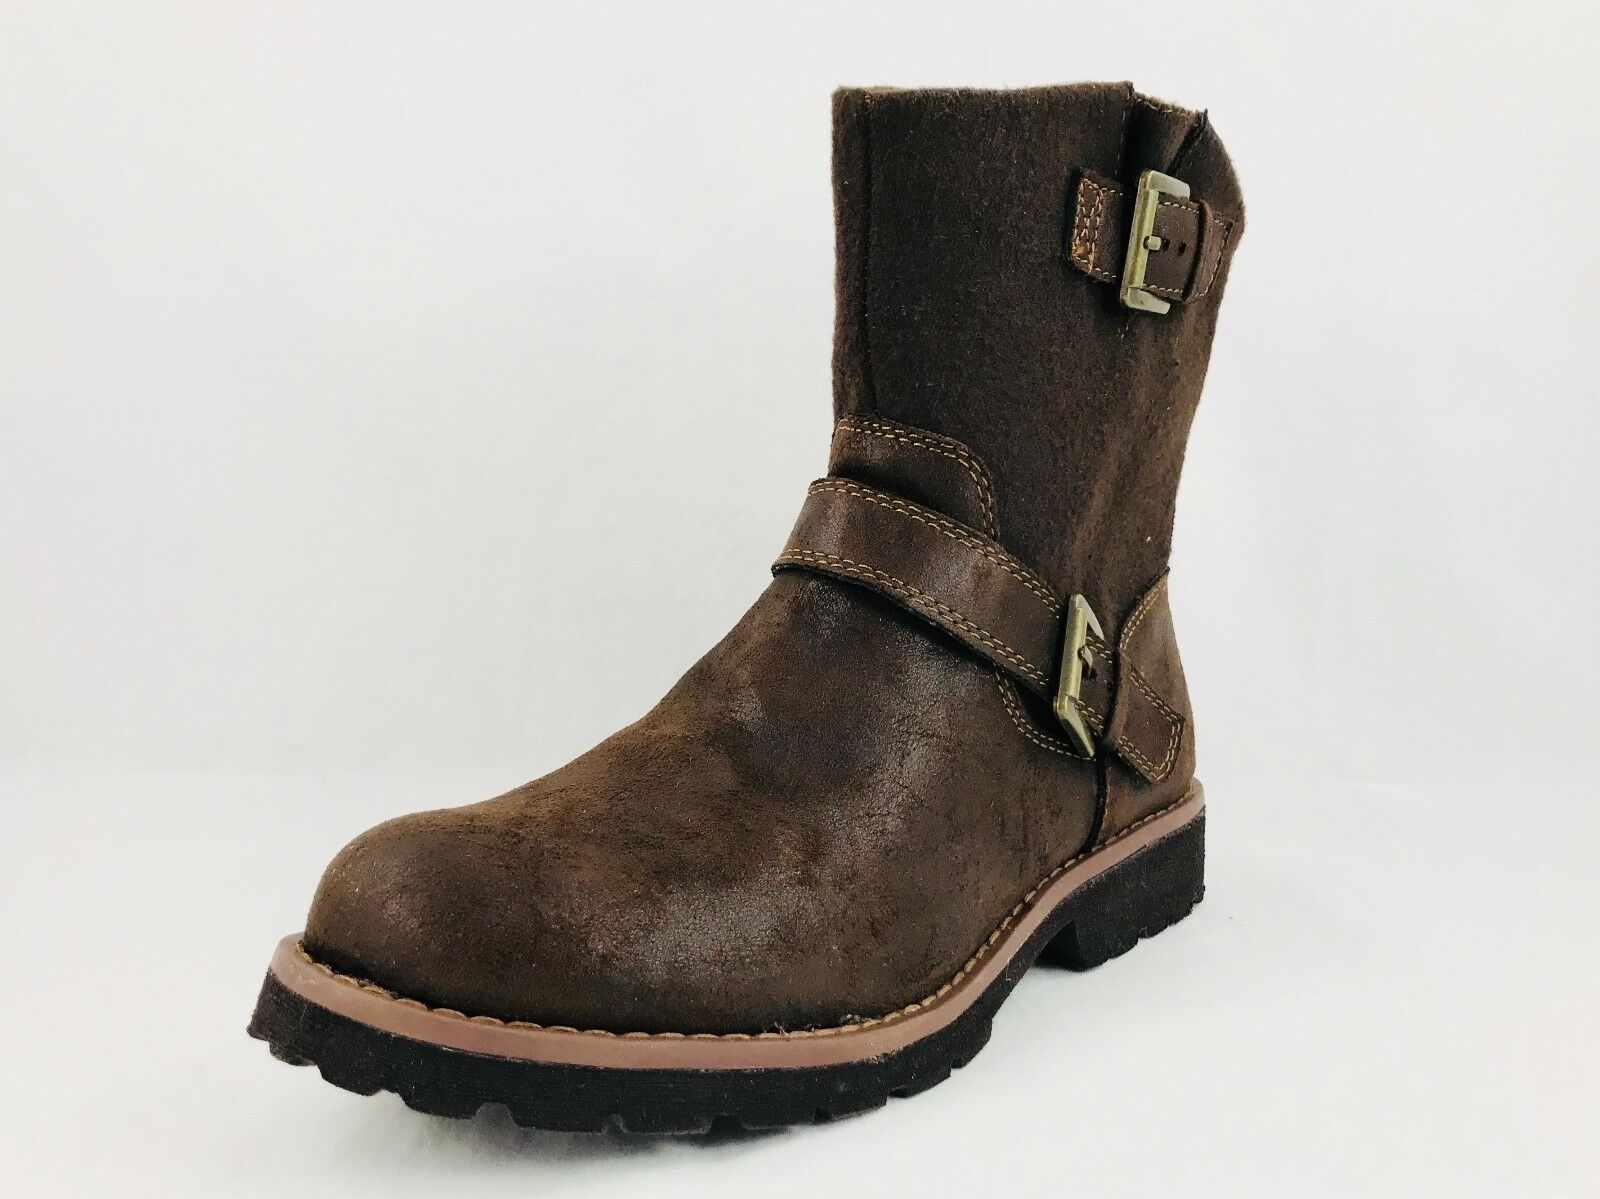 Born Concepts B.O.C. Volos Side Zip Braun Fabric Boot Damenschuhe Sz 9